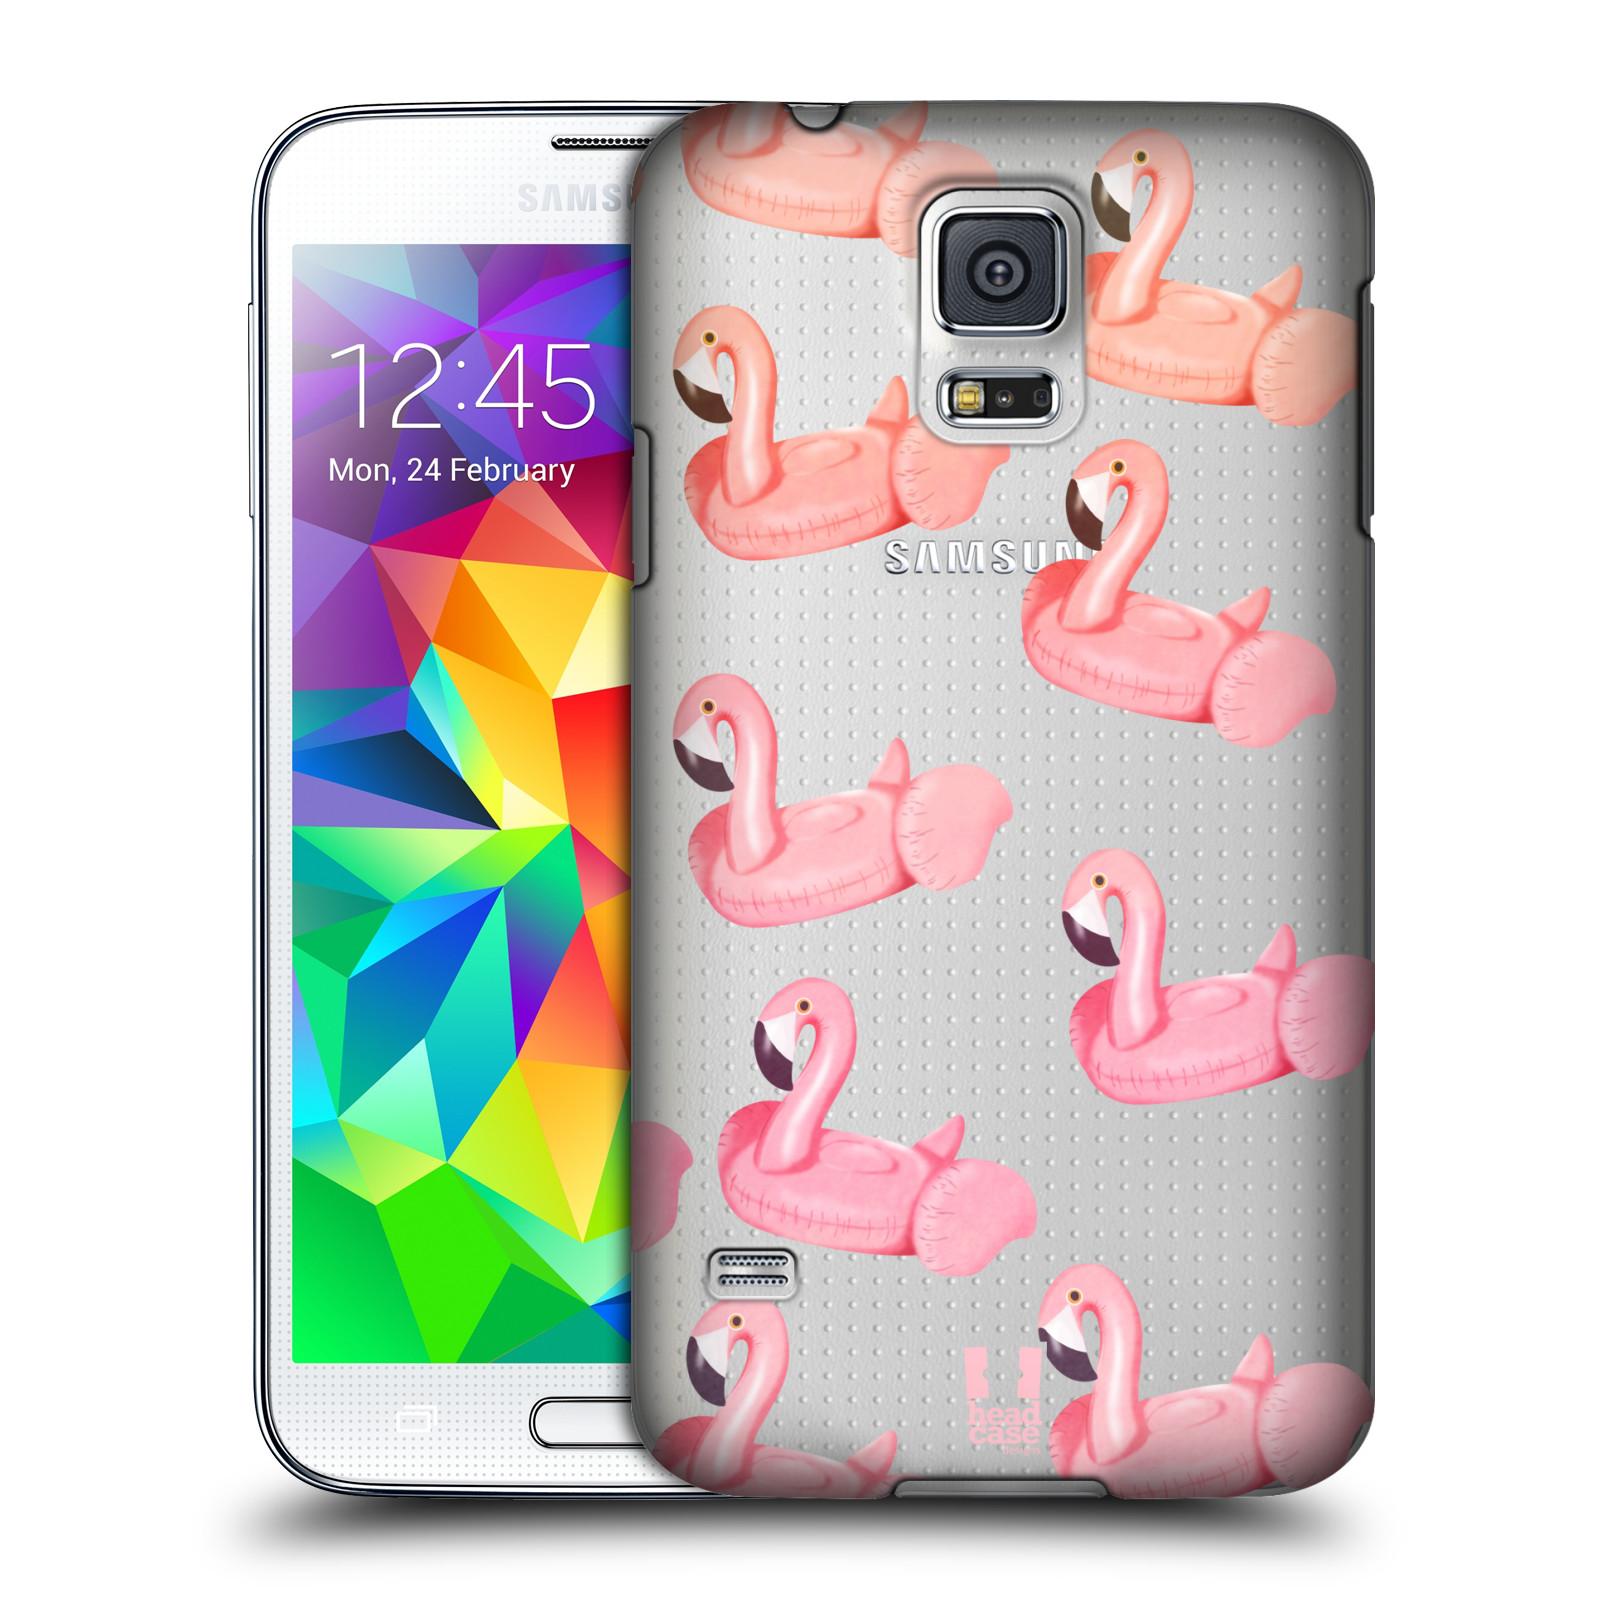 Plastové pouzdro na mobil Samsung Galaxy S5 - Head Case - Kruh plaměňák